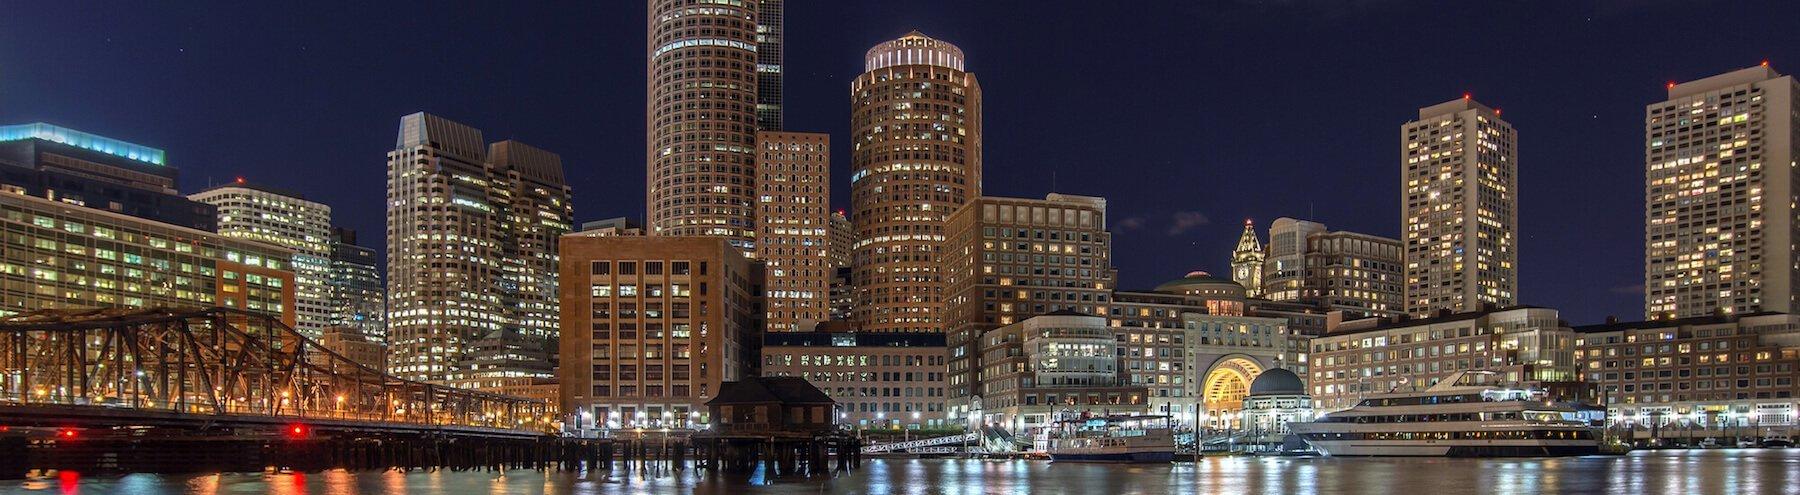 limo service in Boston